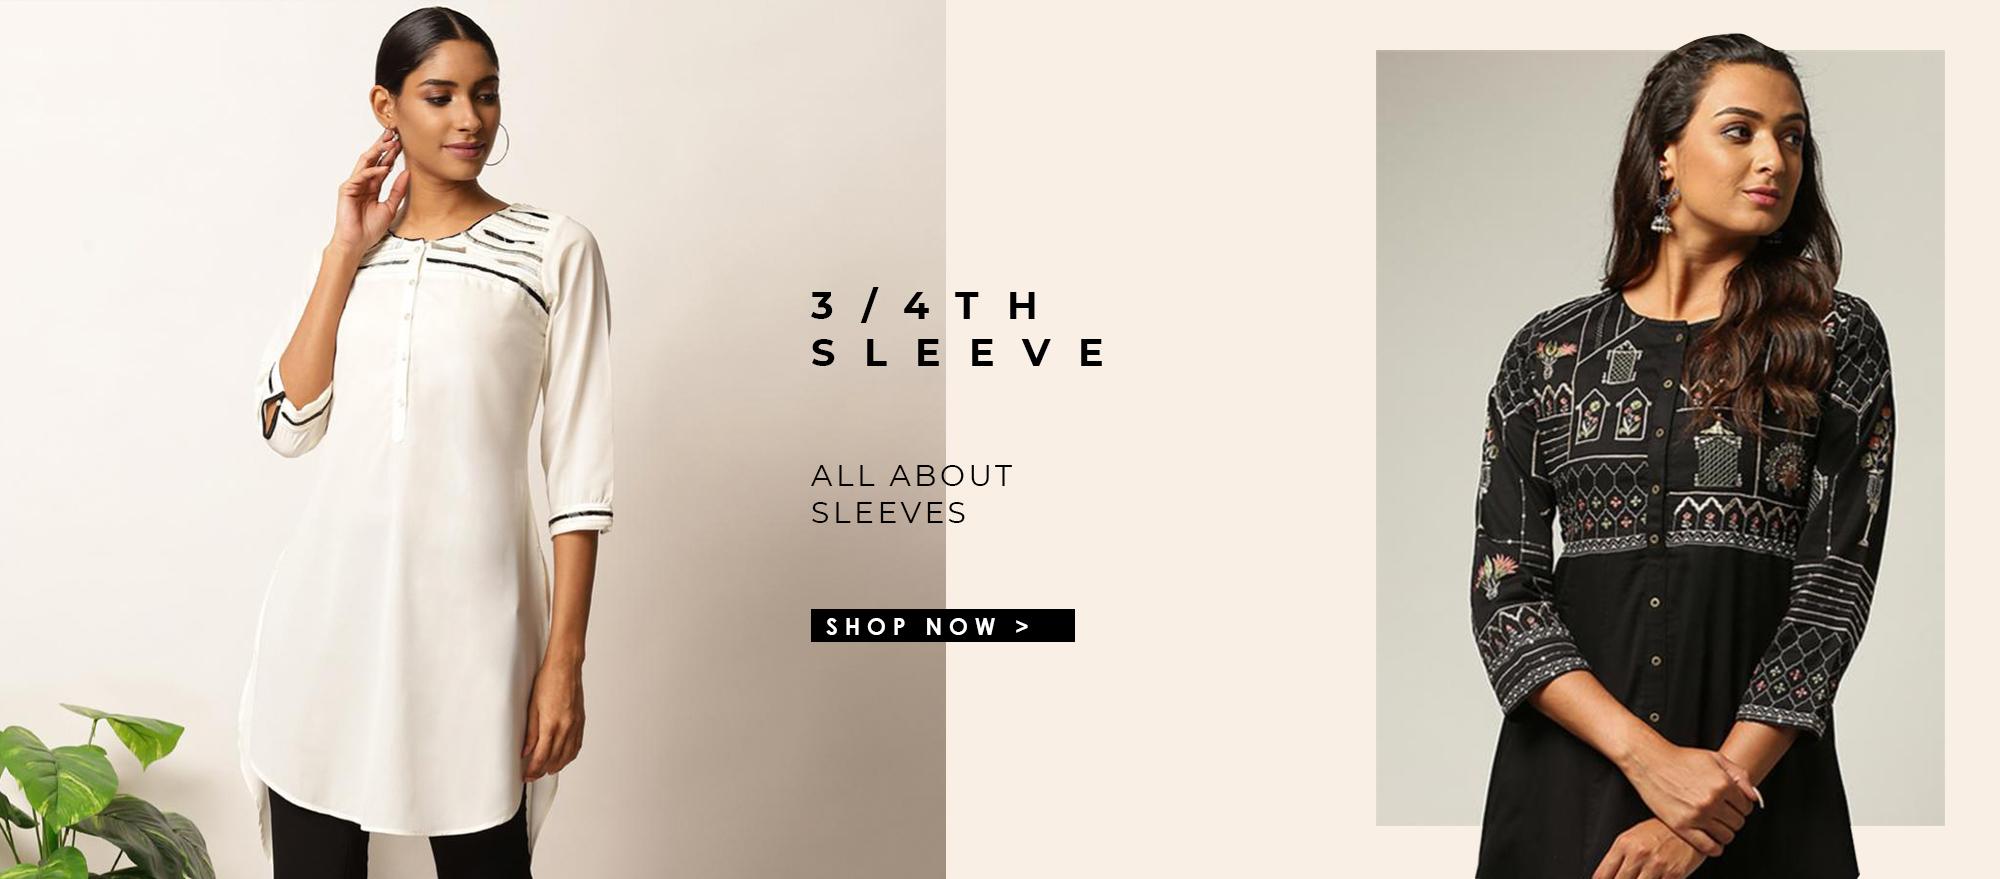 3-4th_sleeves